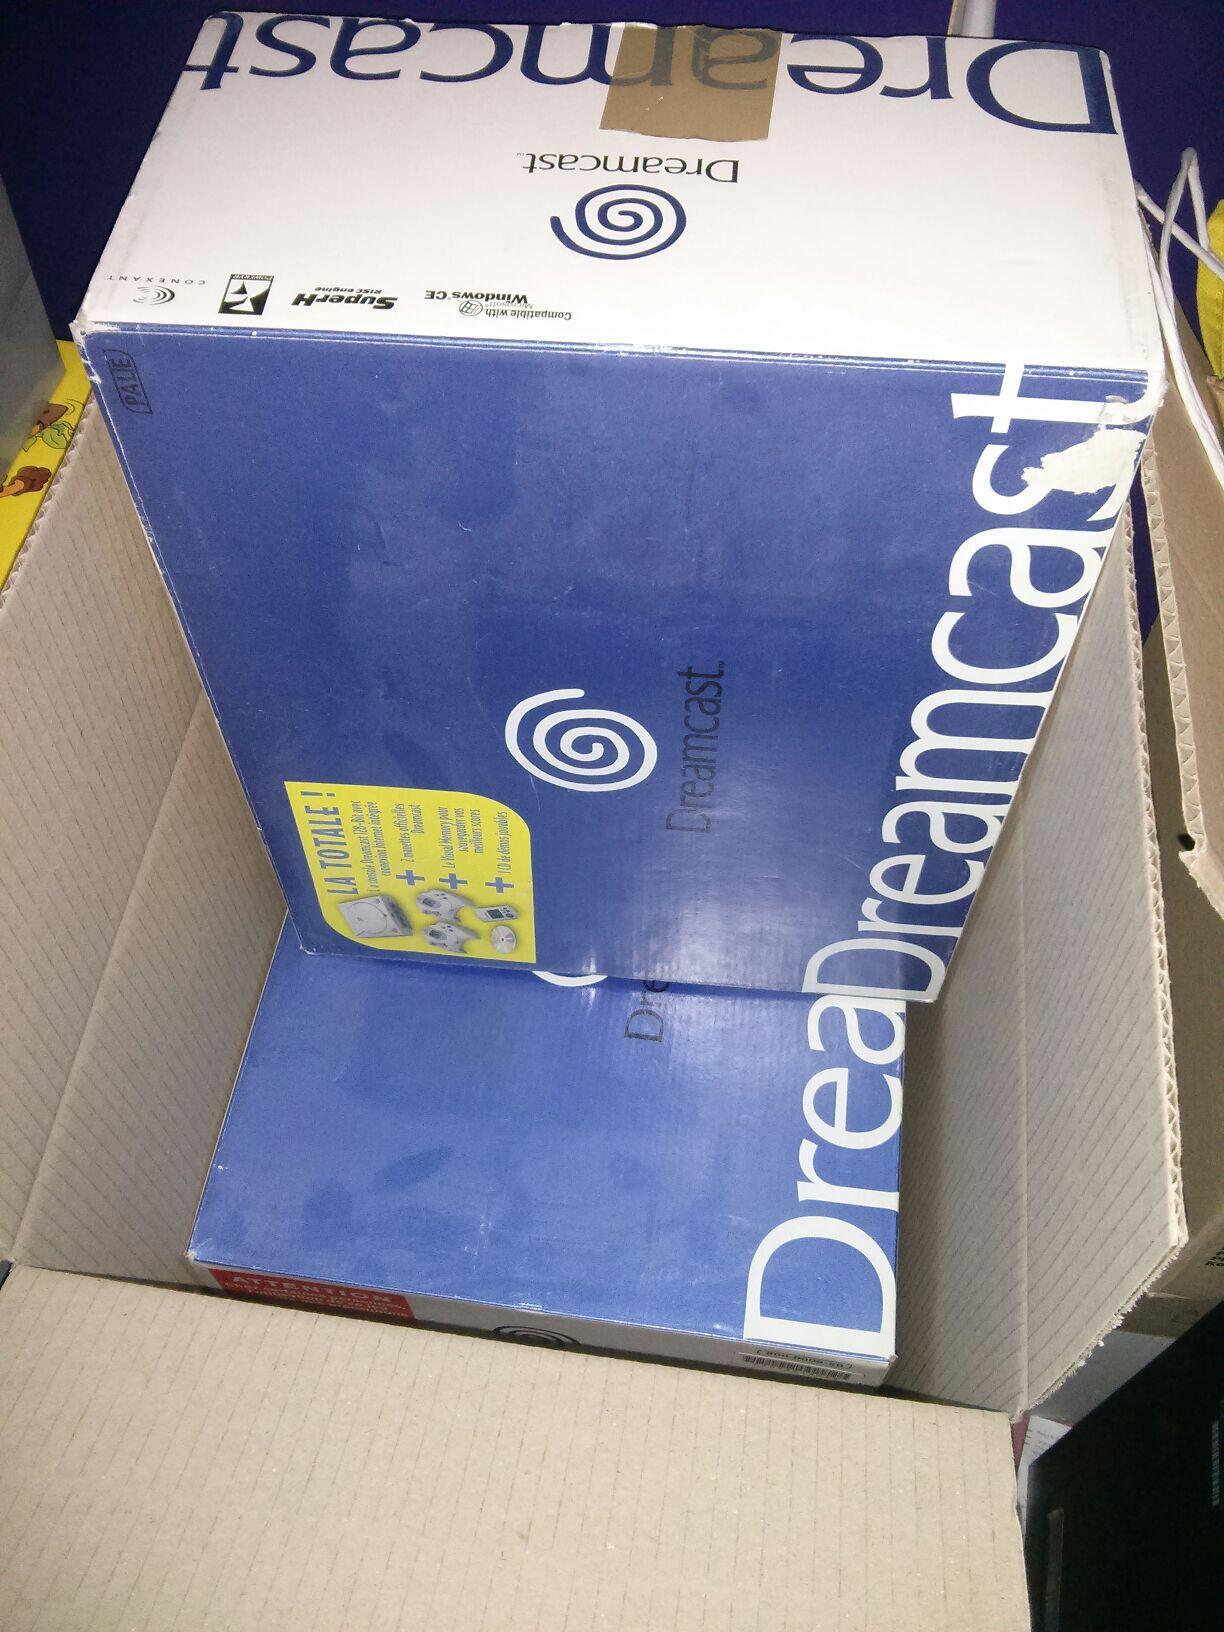 Two boxed DreamCast... cc @Mr_Kia http://t.co/uPzrGK8l1Q